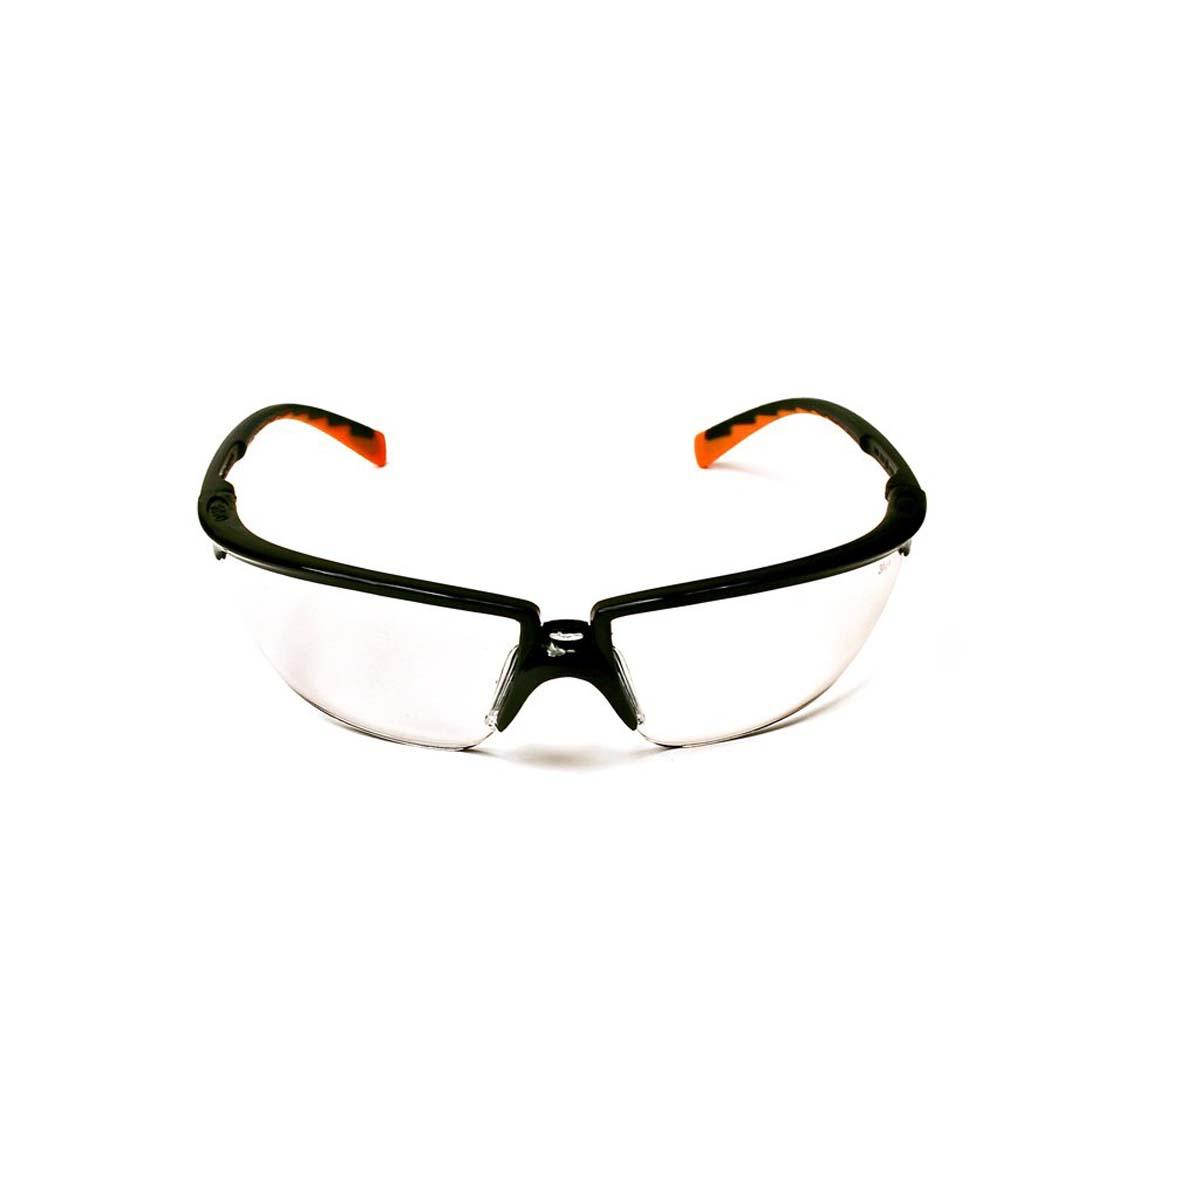 "3Mâ""¢ Privoâ""¢ Protective Eyewear 12261-00000-20 Clear Anti-Fog Lens, Black Frame"